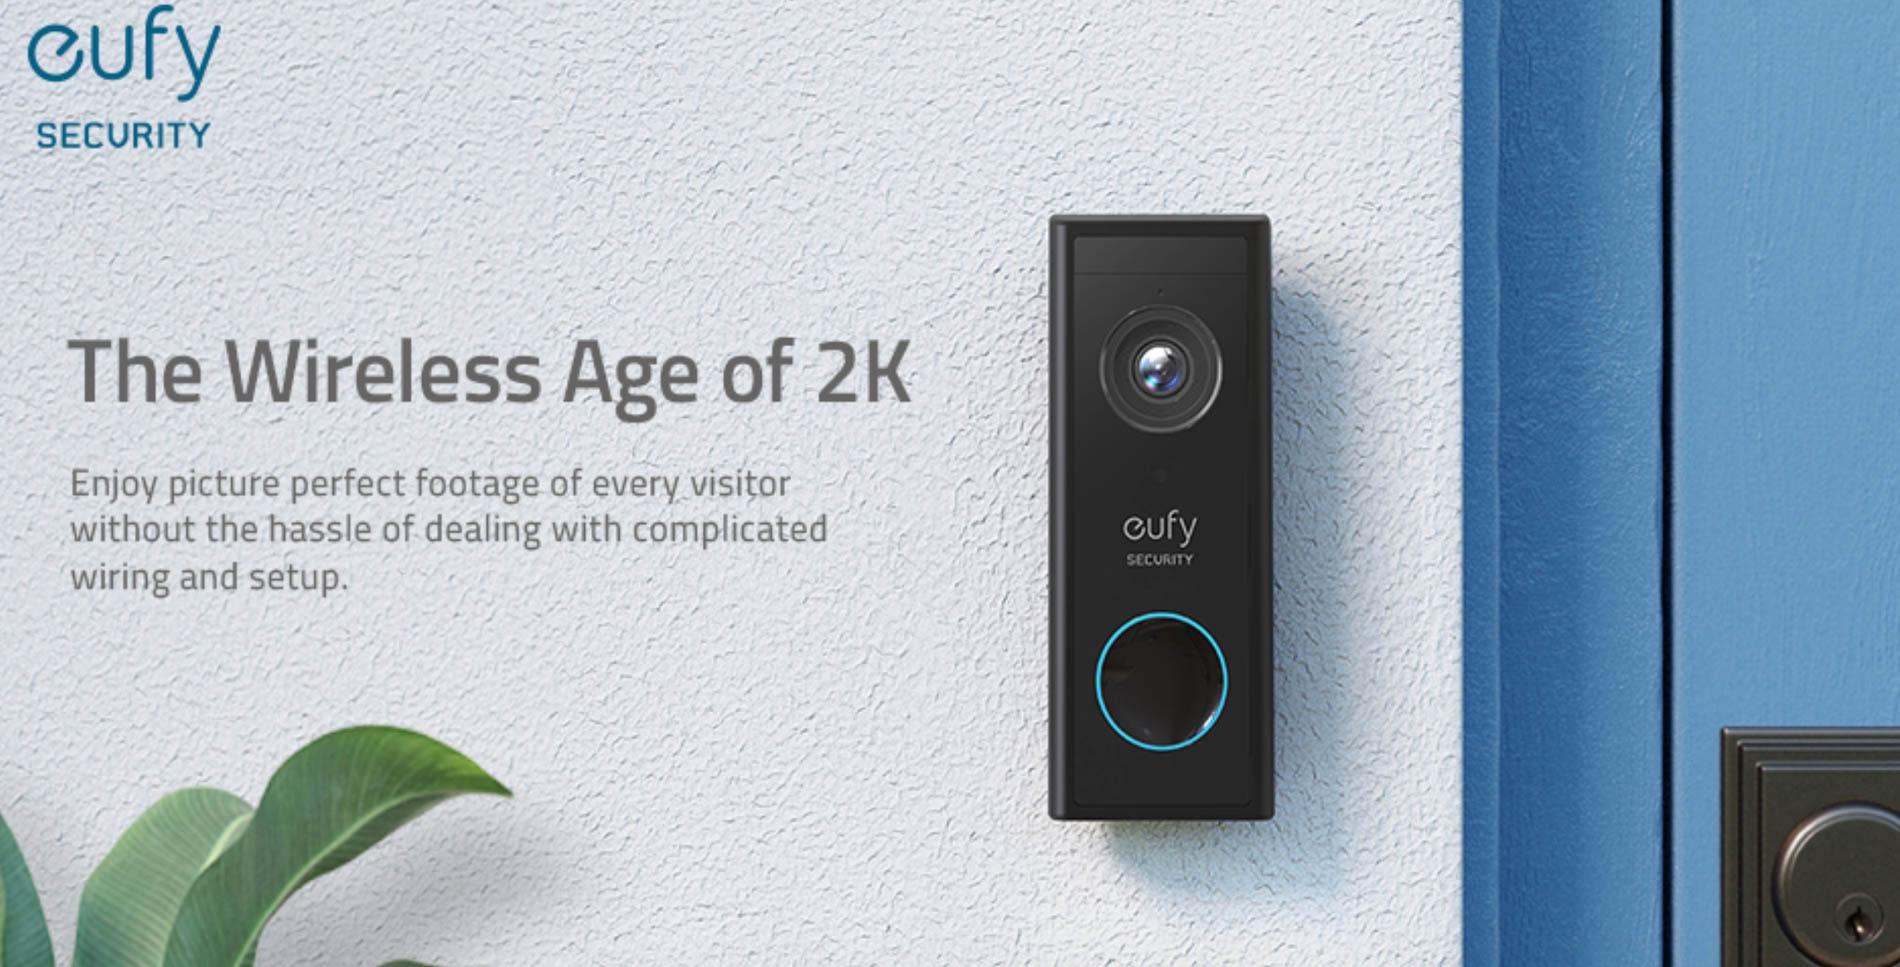 Reports suggest Eufy Video Doorbell gains HomeKit support